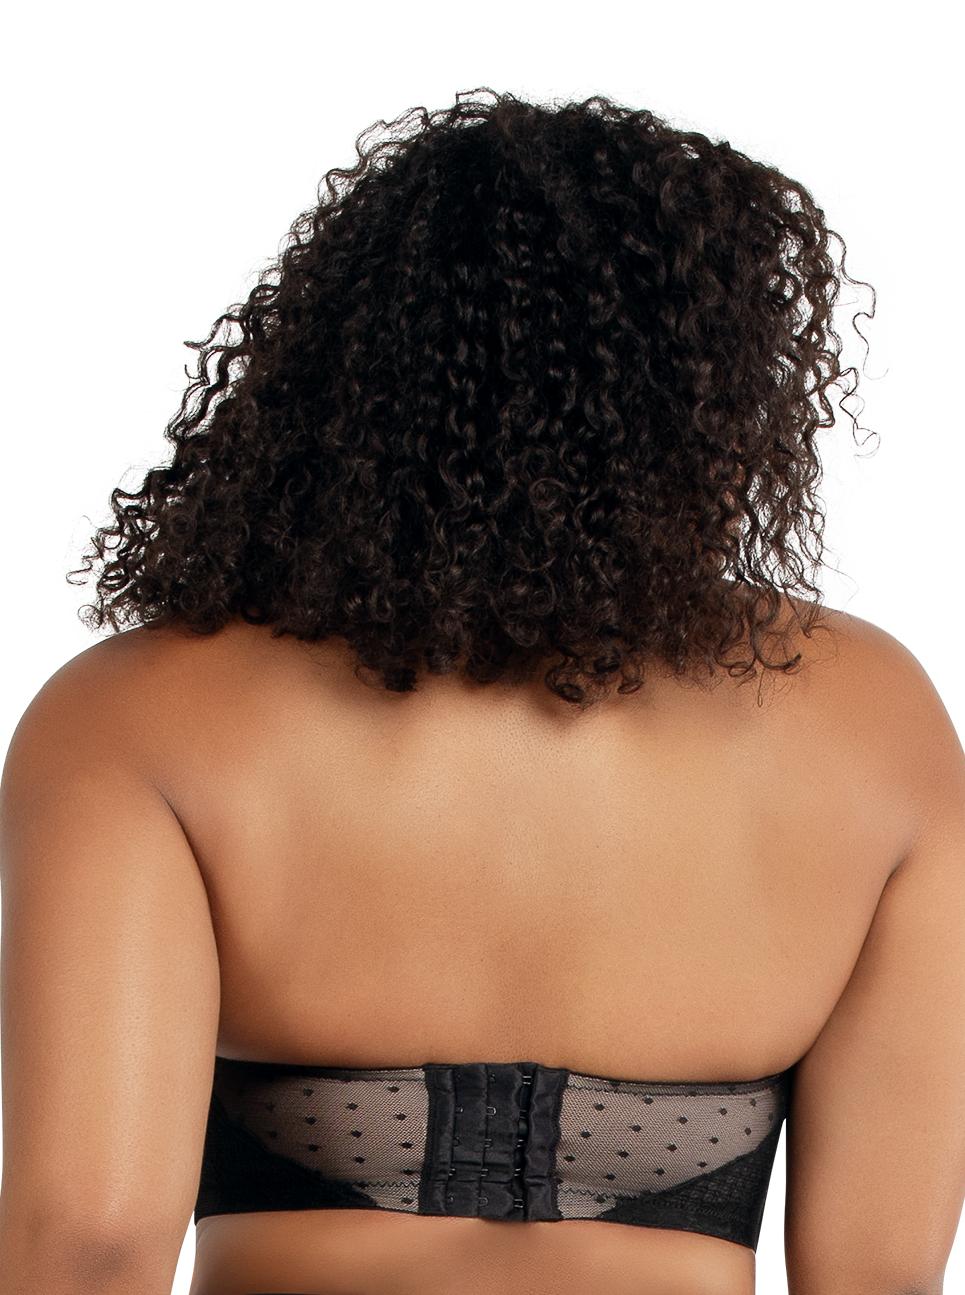 PARFAIT Amber StraplessBraA16812 Black Back - Amber Strapless Bra Black A16812